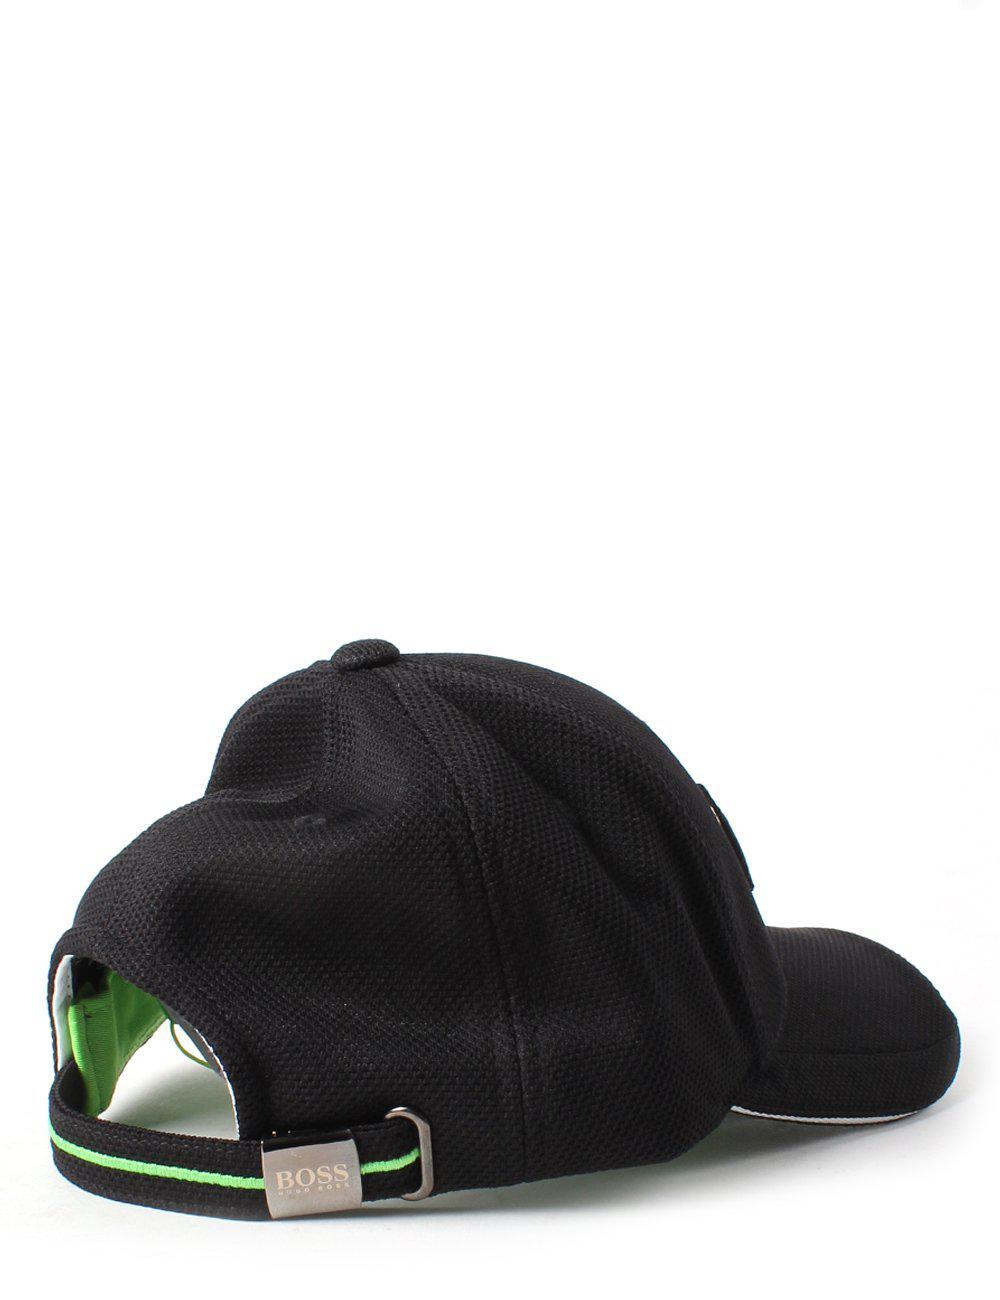 a2b42725 BOSS Athleisure Cap Us Men's Logo Cap Black in Black for Men - Lyst